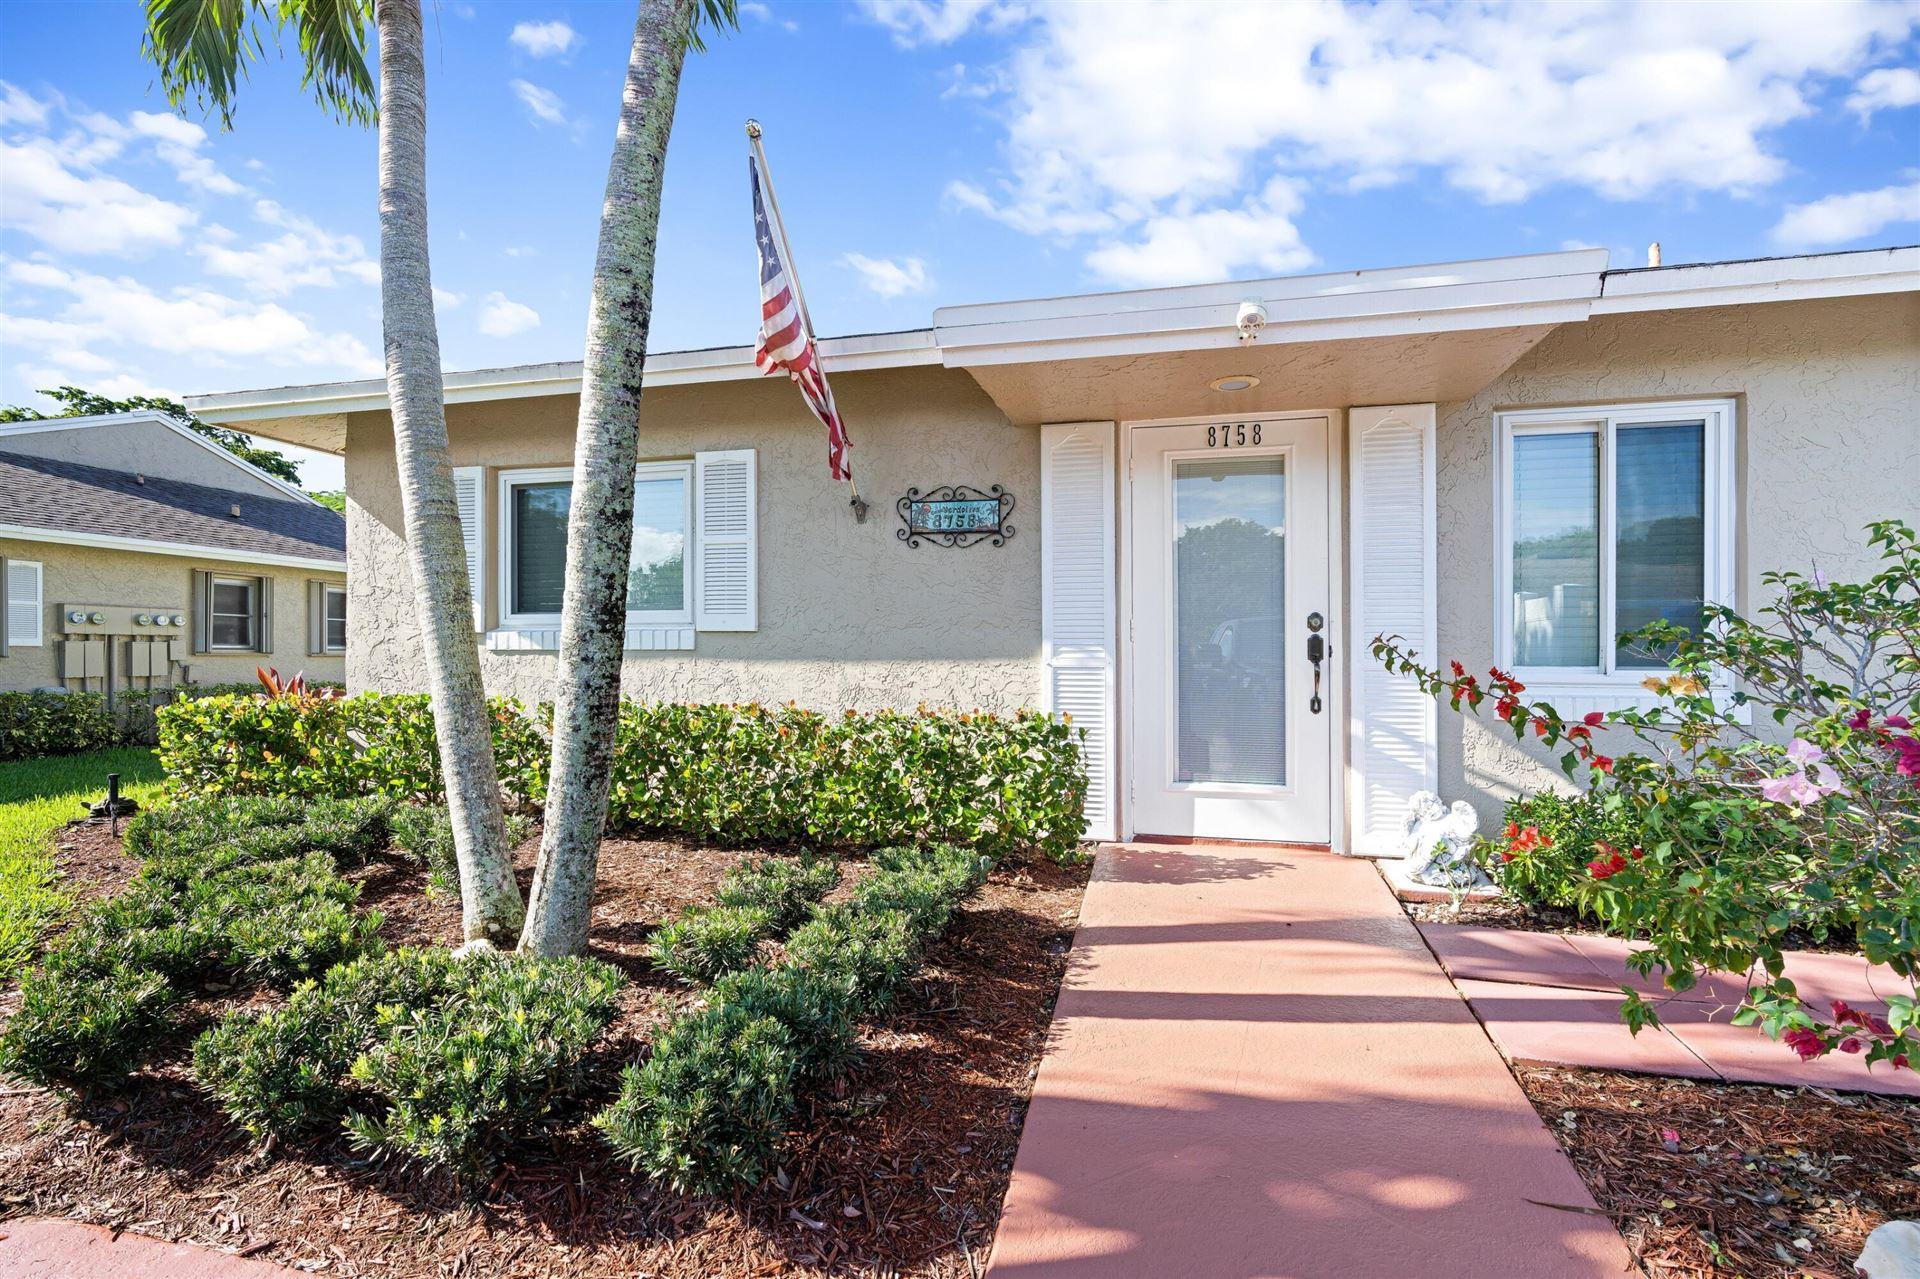 8758 Windrow Way #A, Boca Raton, FL 33496 - MLS#: RX-10751429